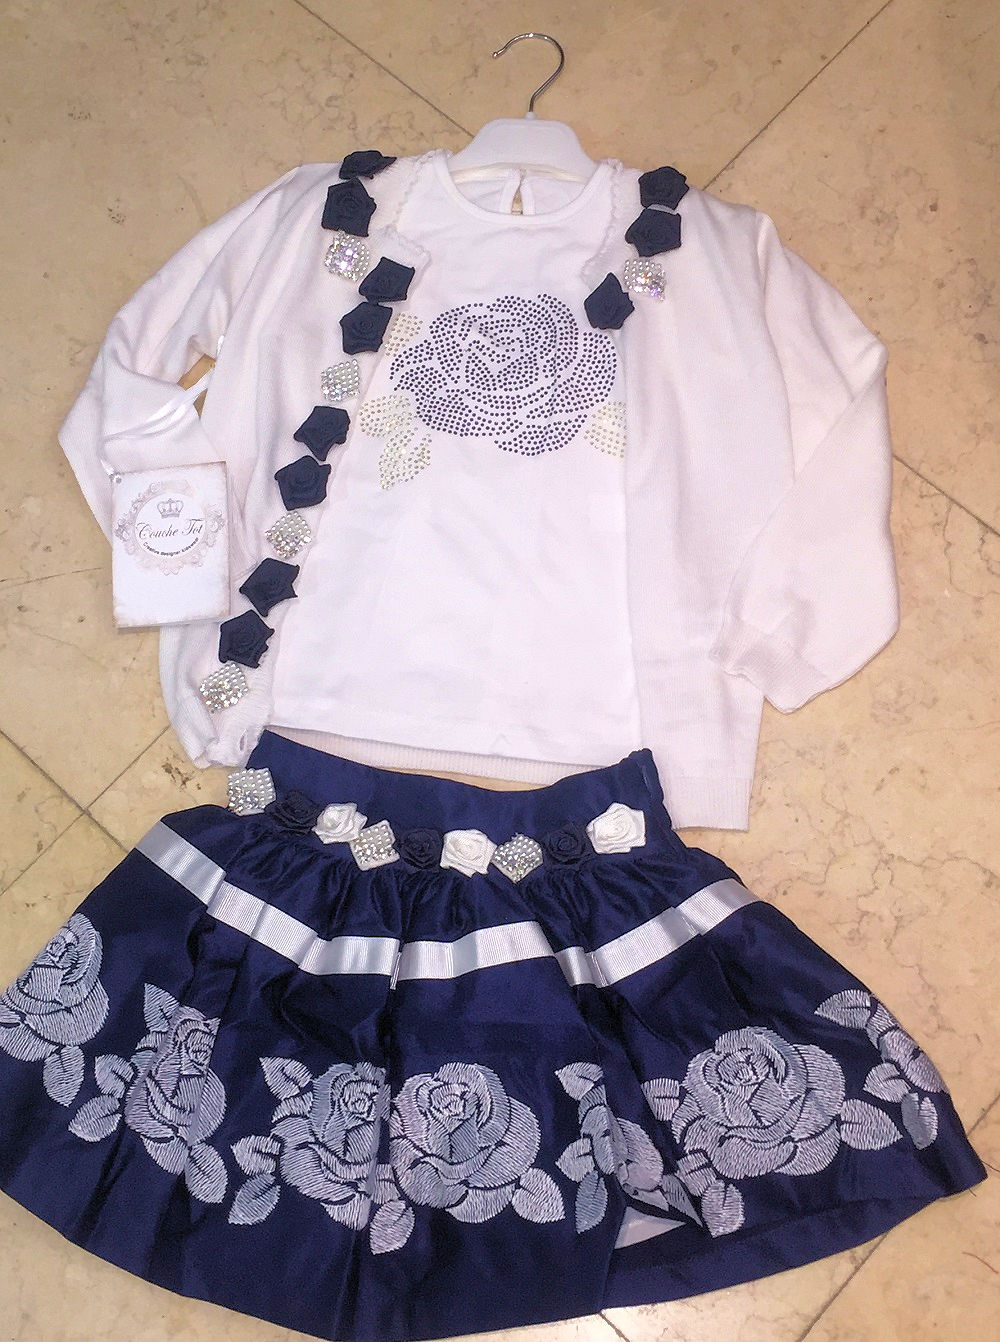 Couche Tot Flower Skirt Set Navy Pink Wonderland